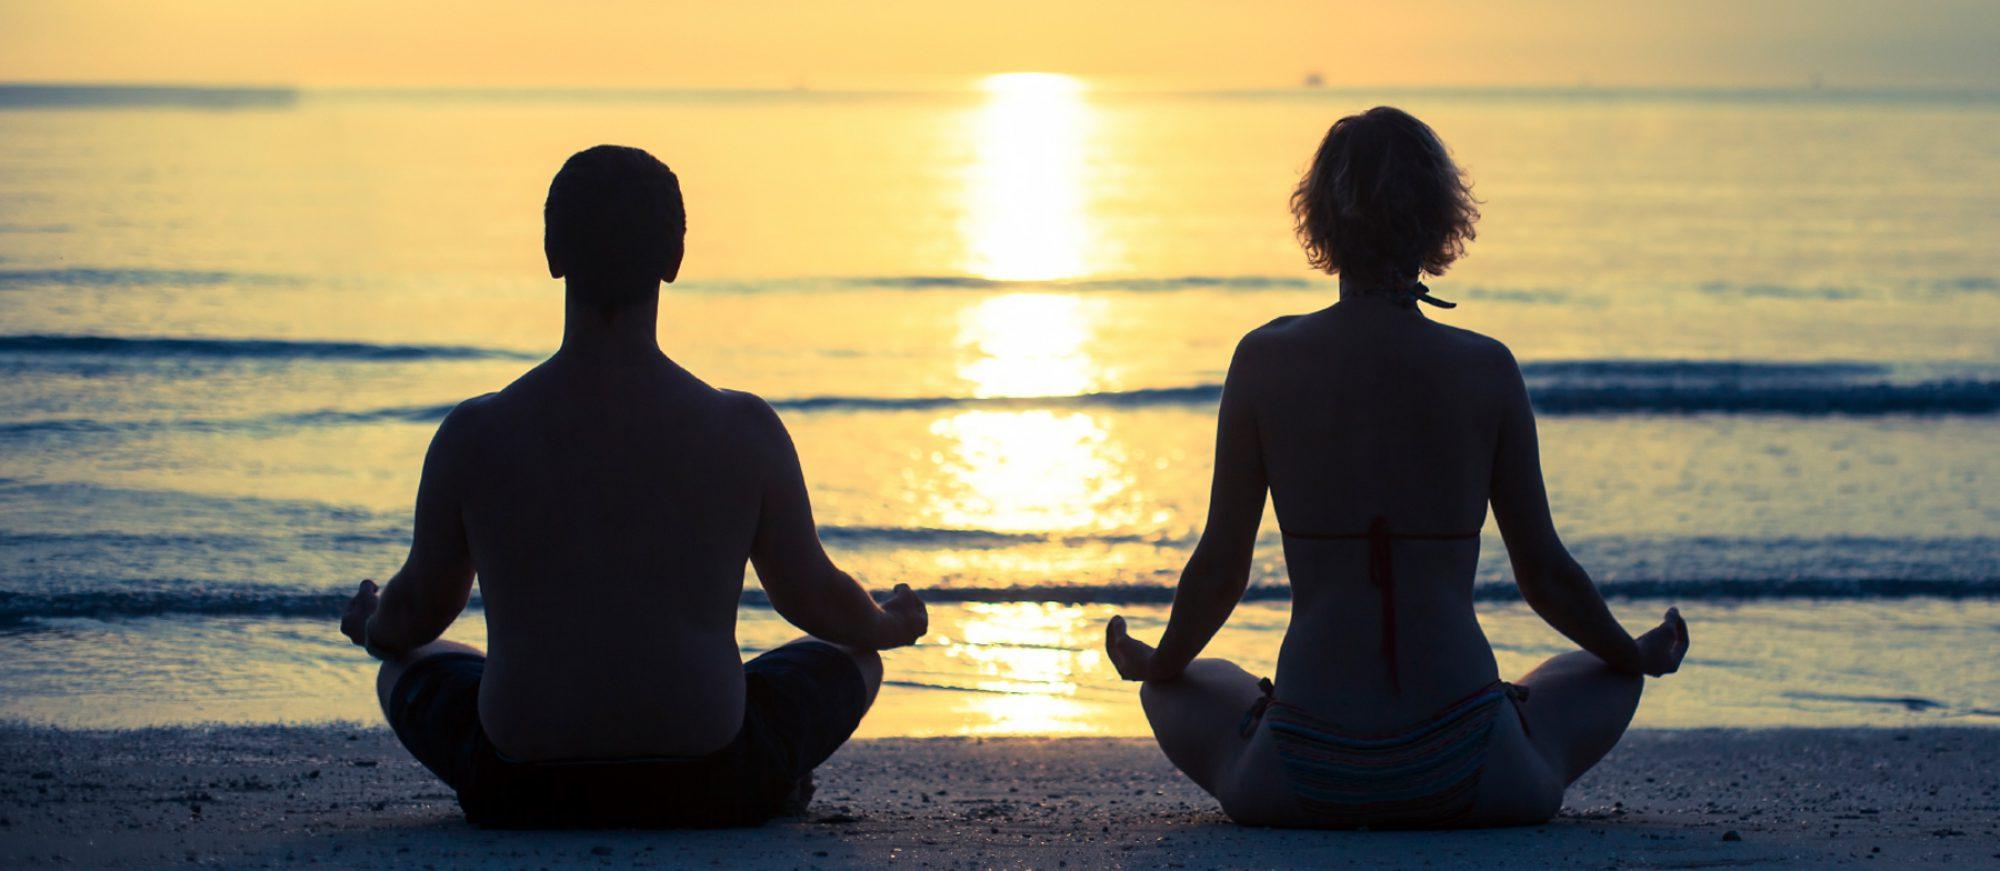 7dimensionsofwellness 7 Dimensions Of Wellness